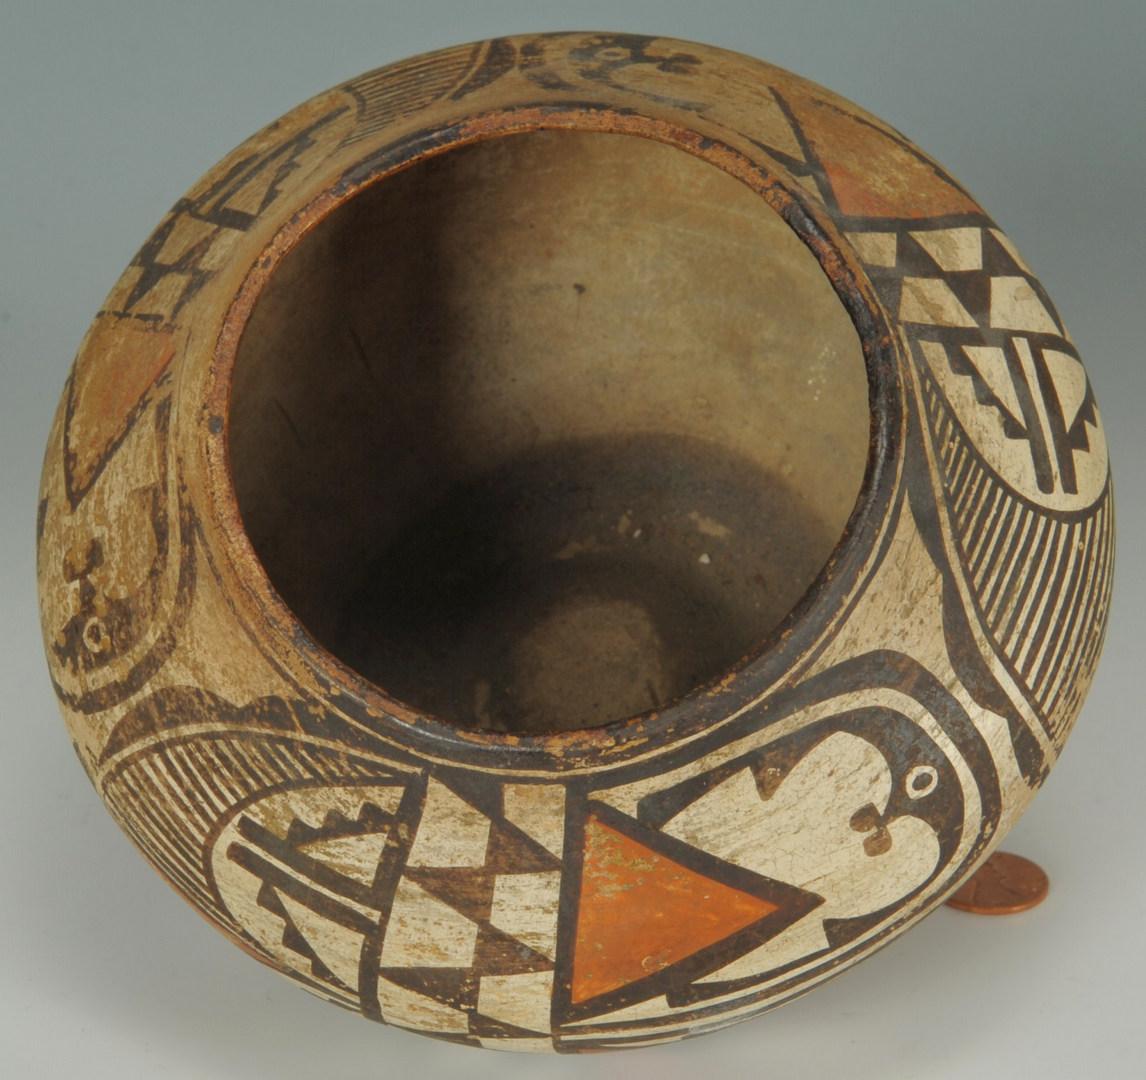 Lot 396: Acoma olla jar, circa 1920